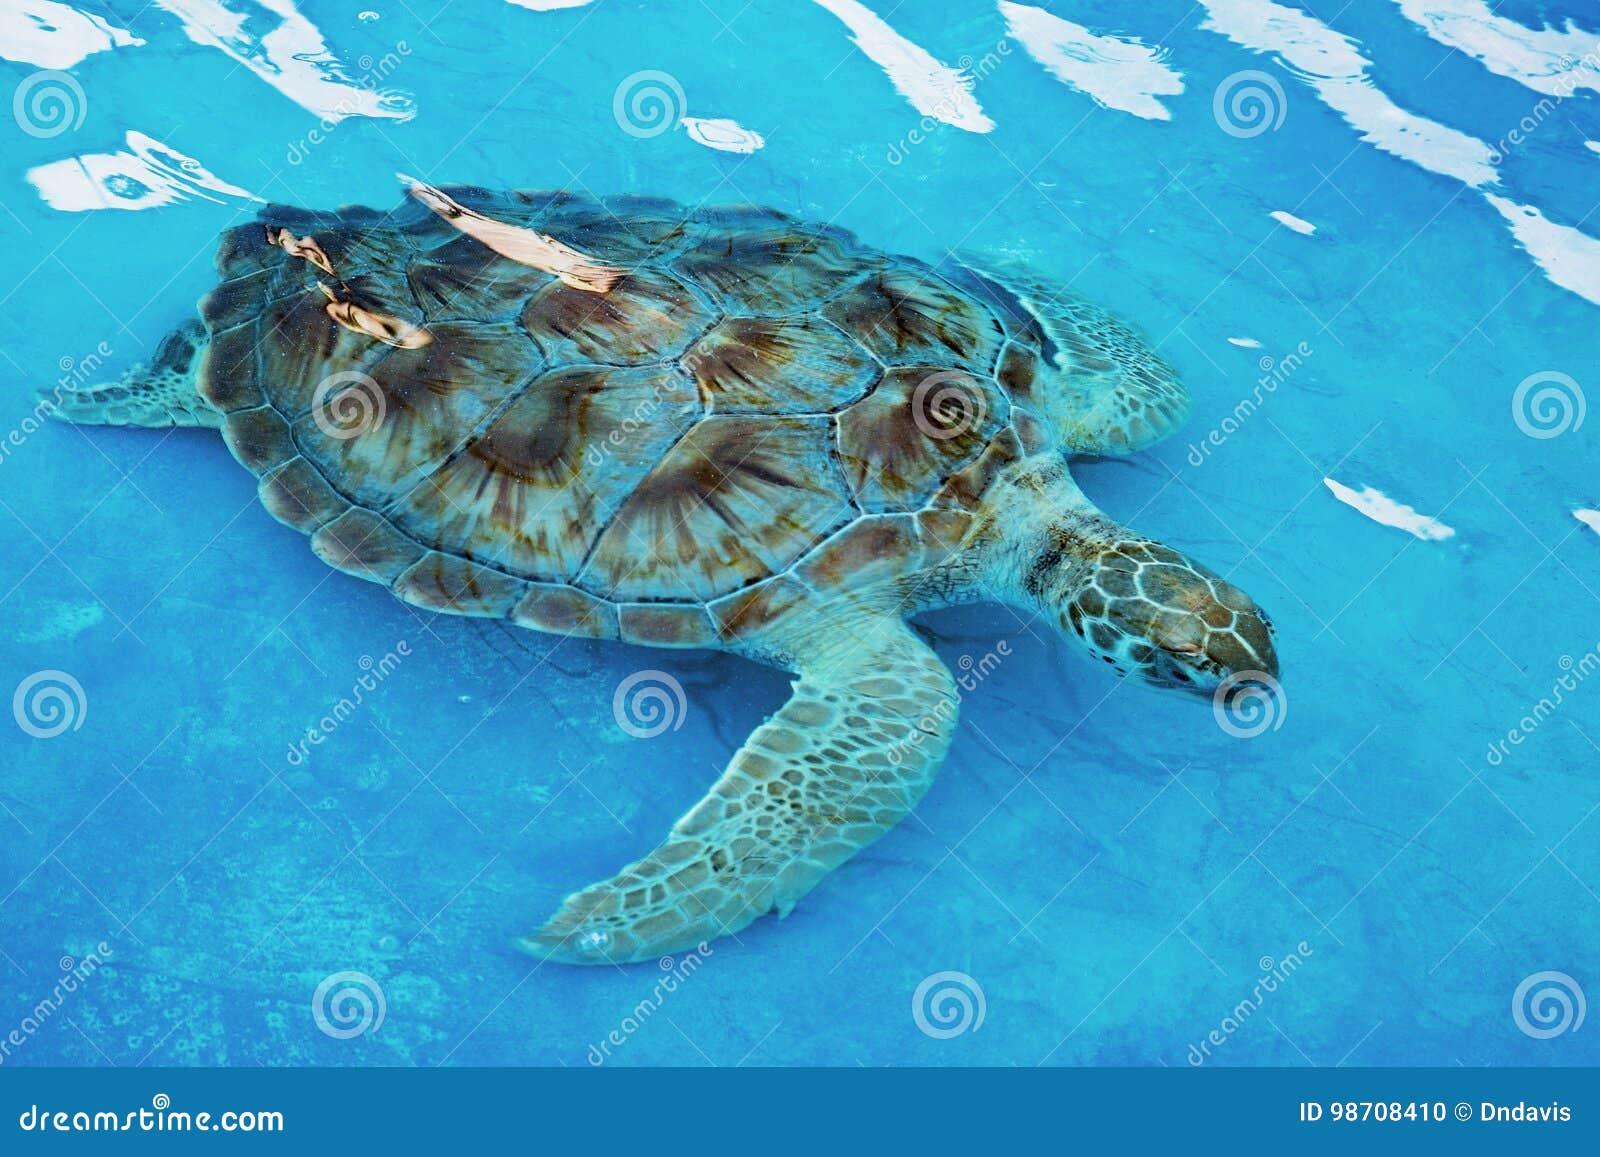 Hawksbill sea turtle Eretmochelys imbricata is critically endangered sea turtle